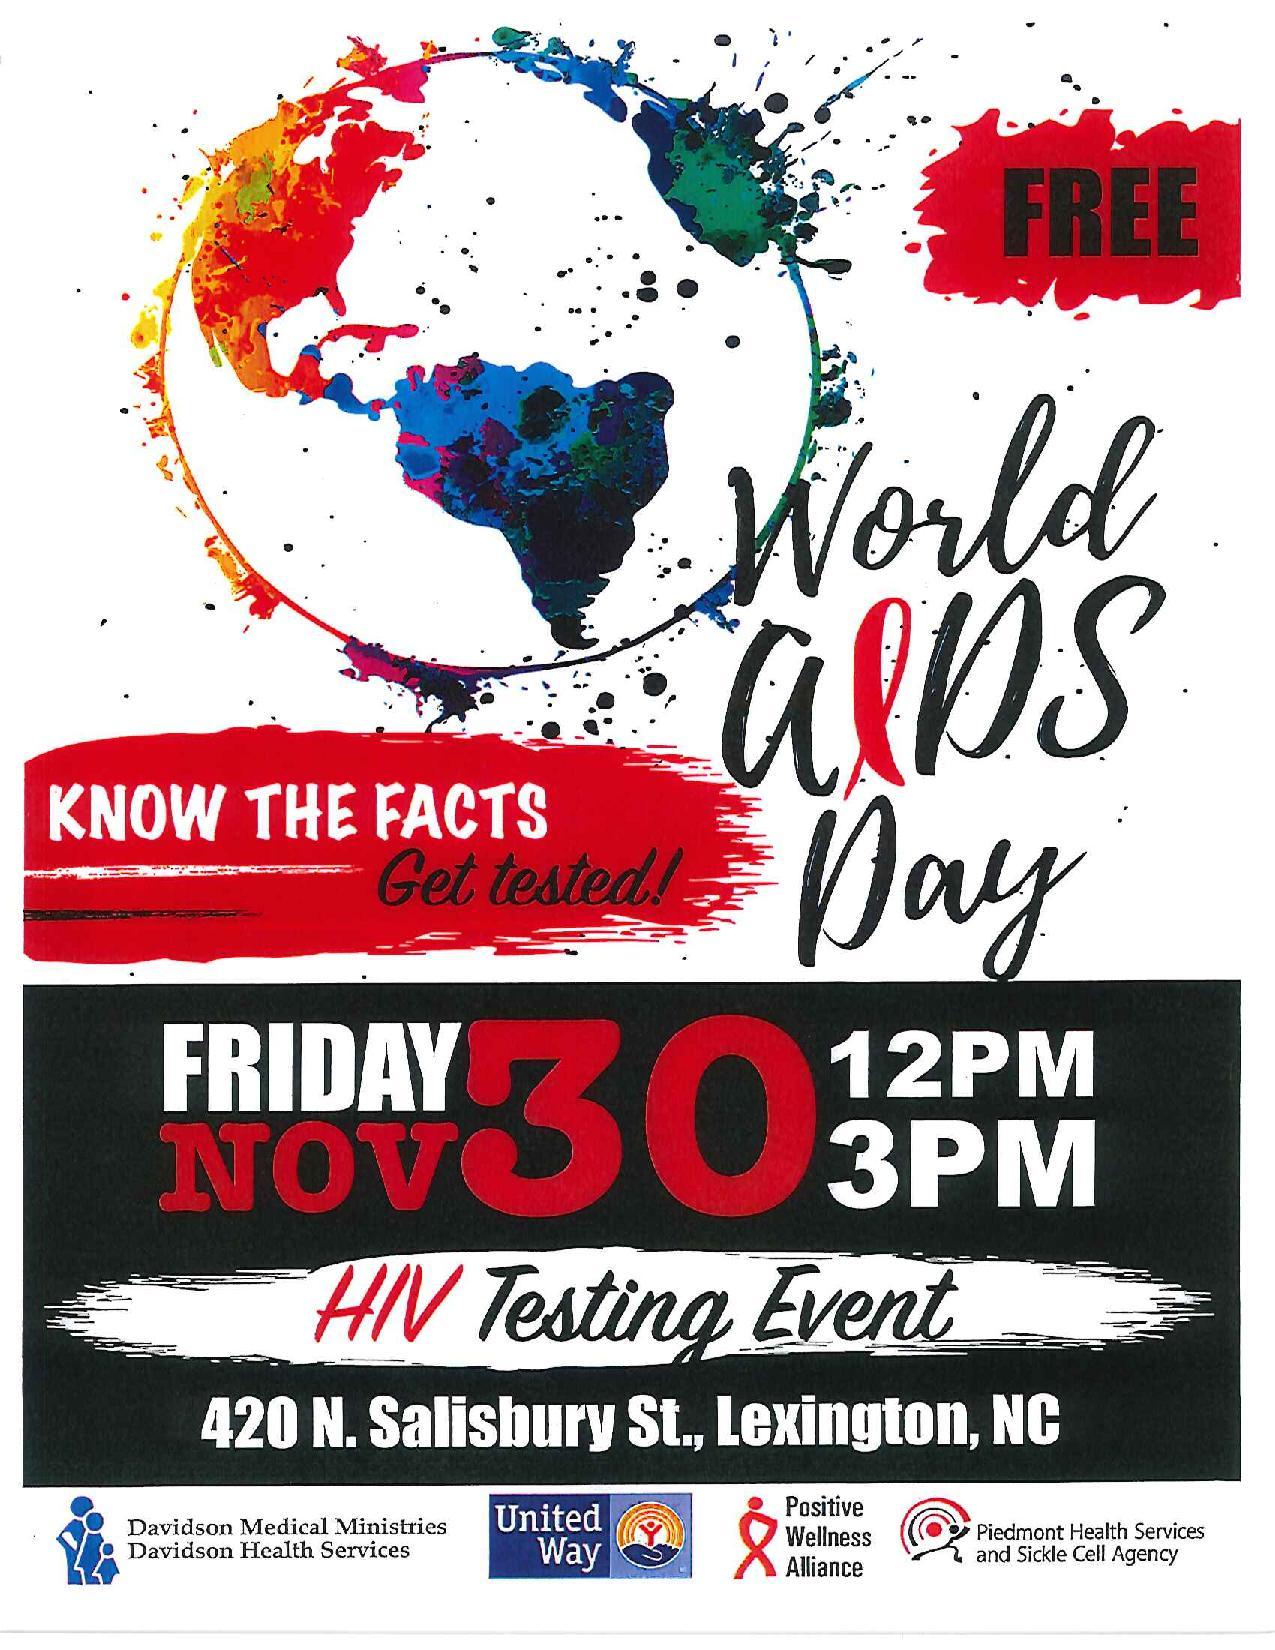 WAD HIV testing event_11302018.jpg